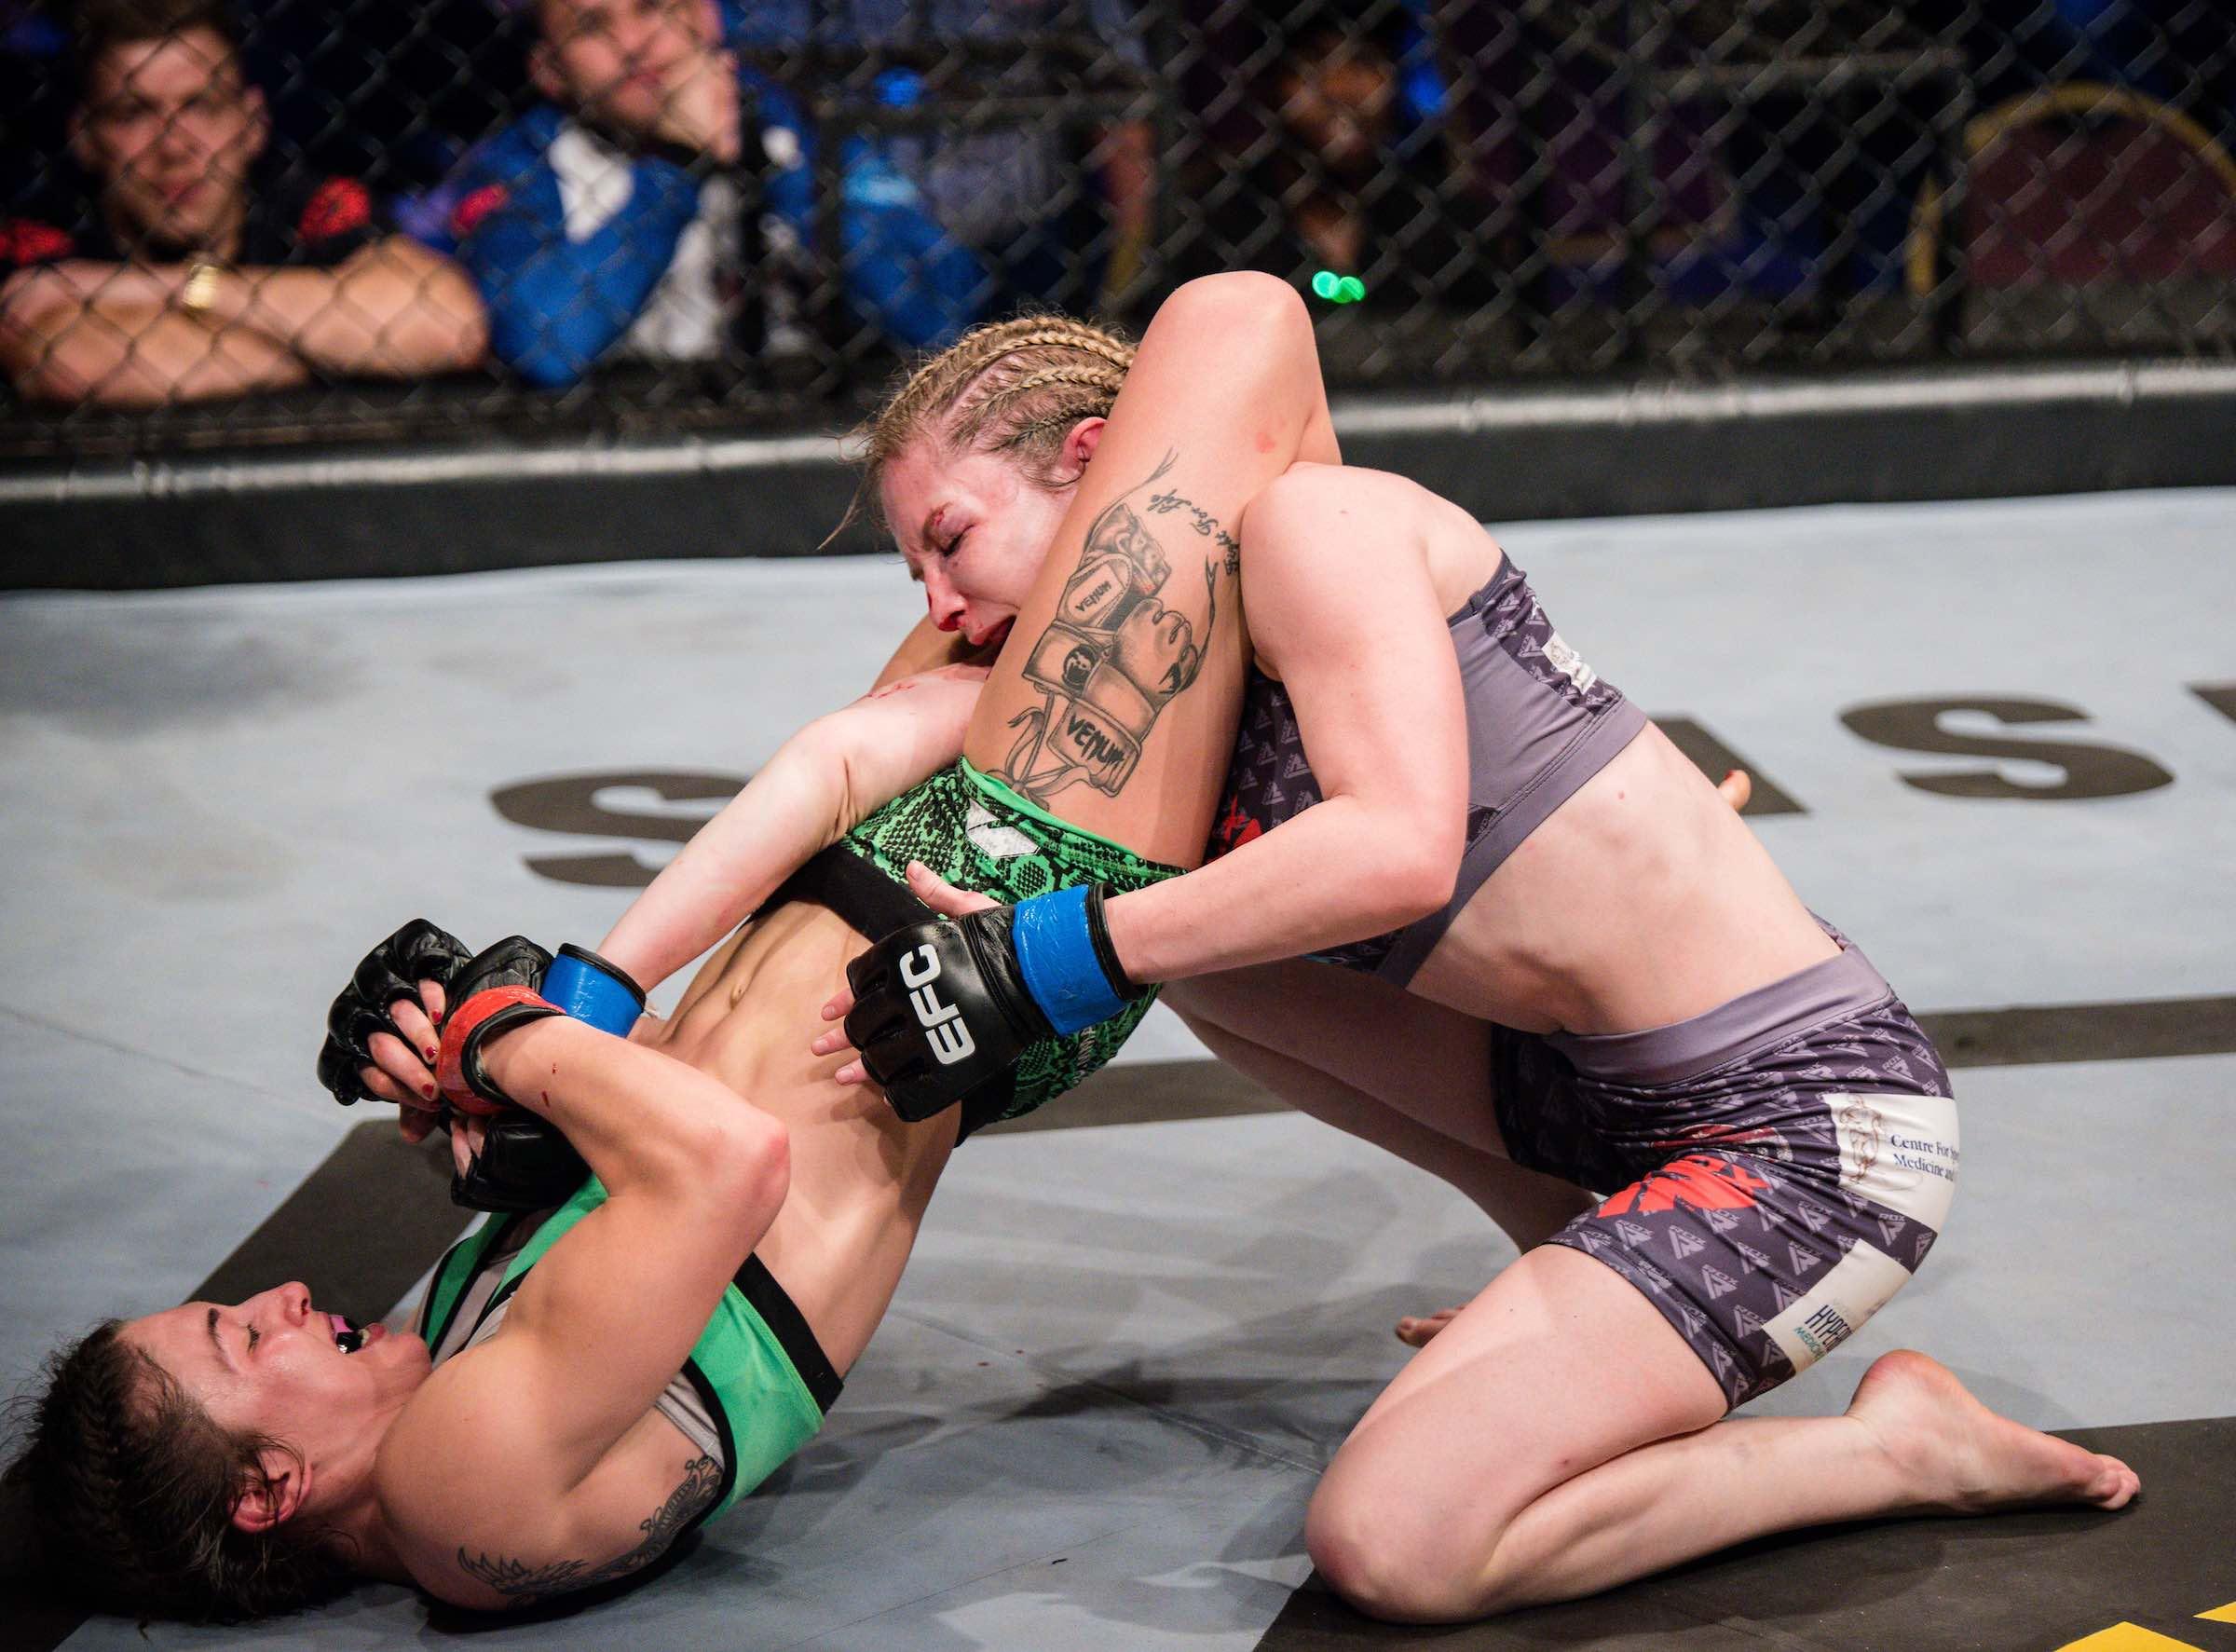 Chiara Penco showcasing her MMA skills to take the Women's Strawweight EFC Title